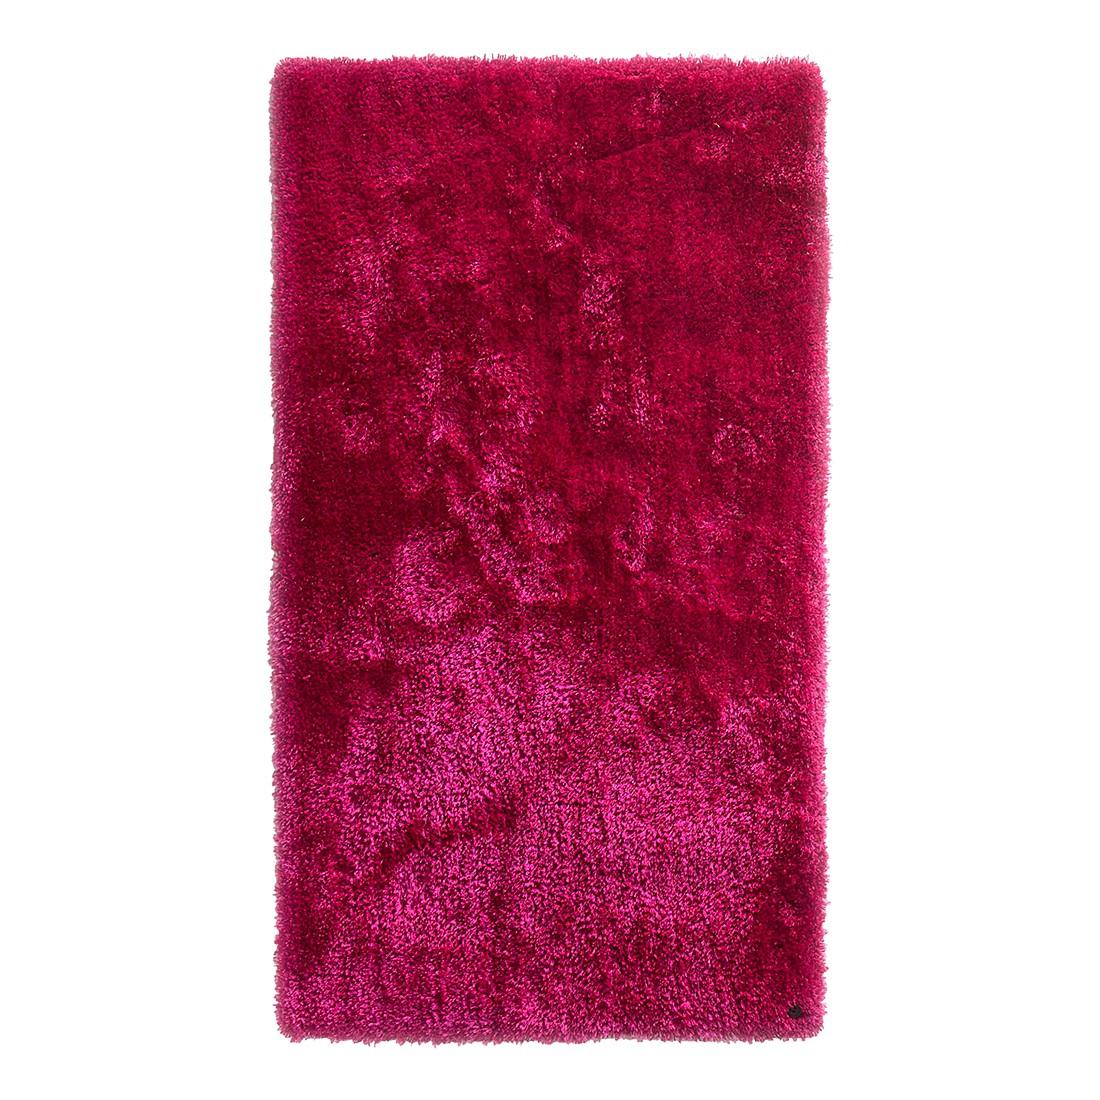 Tapijt Soft Square - roze - maat: 190x290cm, Tom Tailor